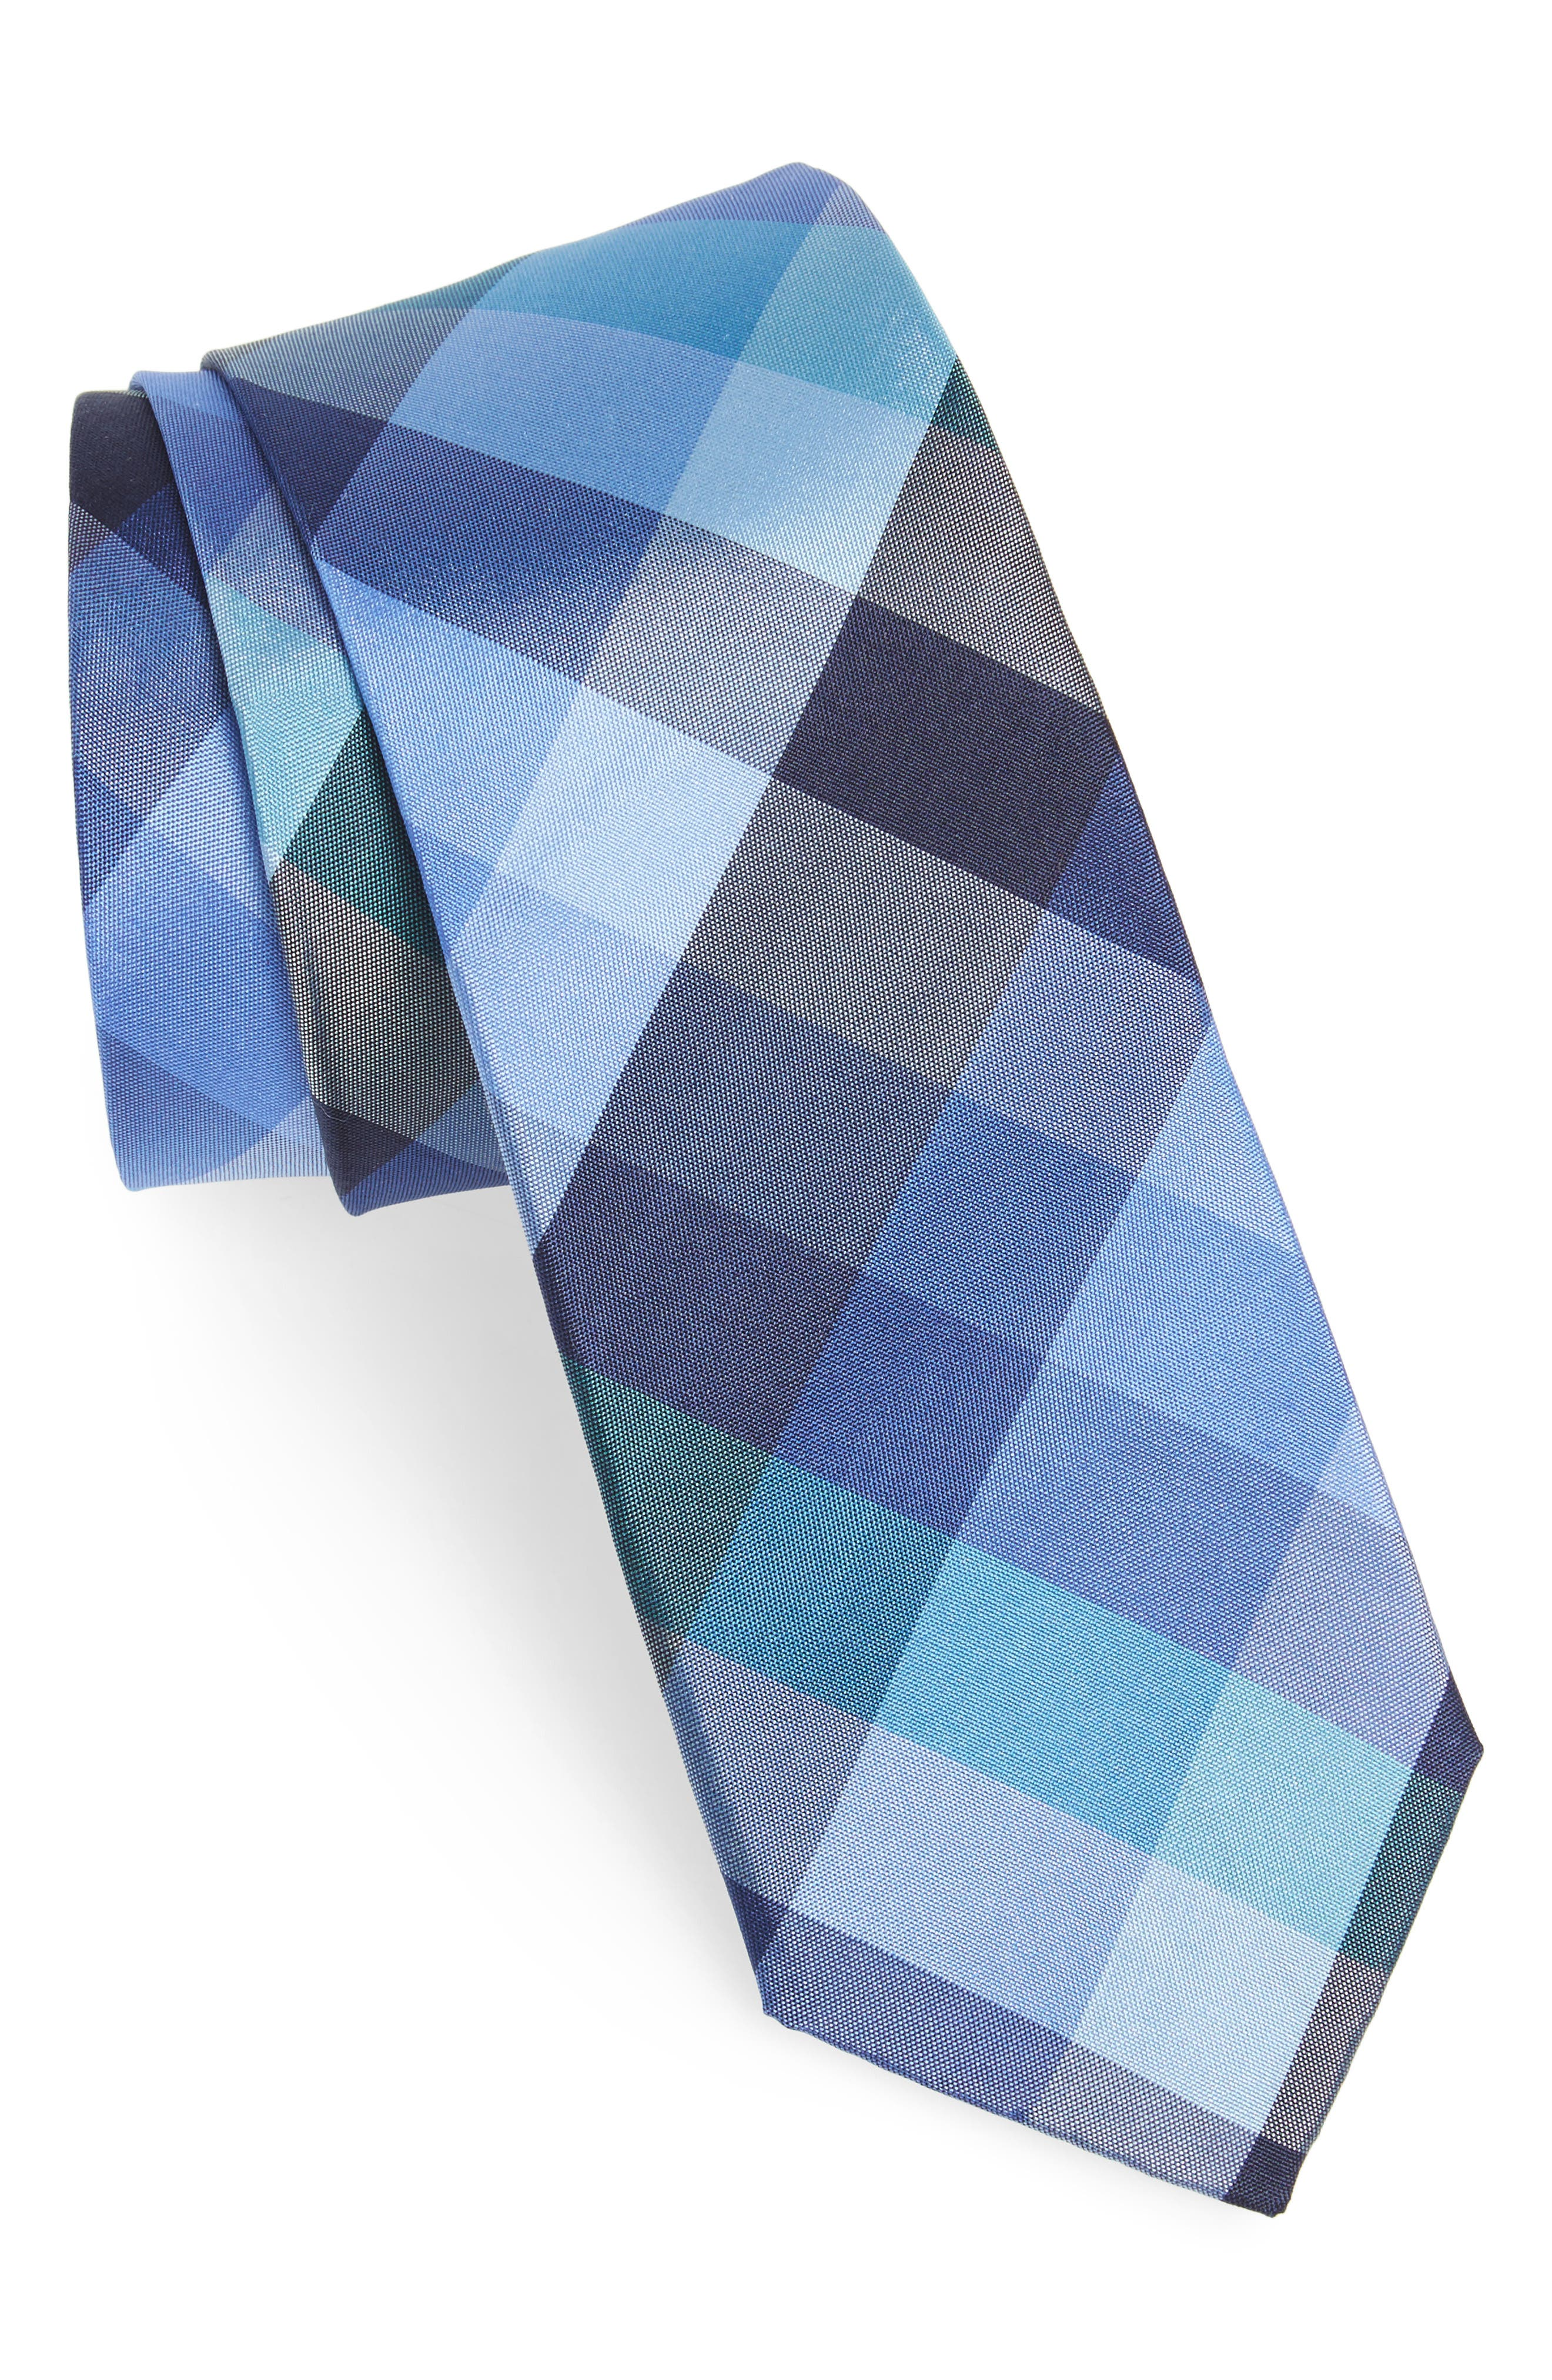 Alternate Image 1 Selected - Nordstrom Men's Shop Autumn Check Silk Skinny Tie